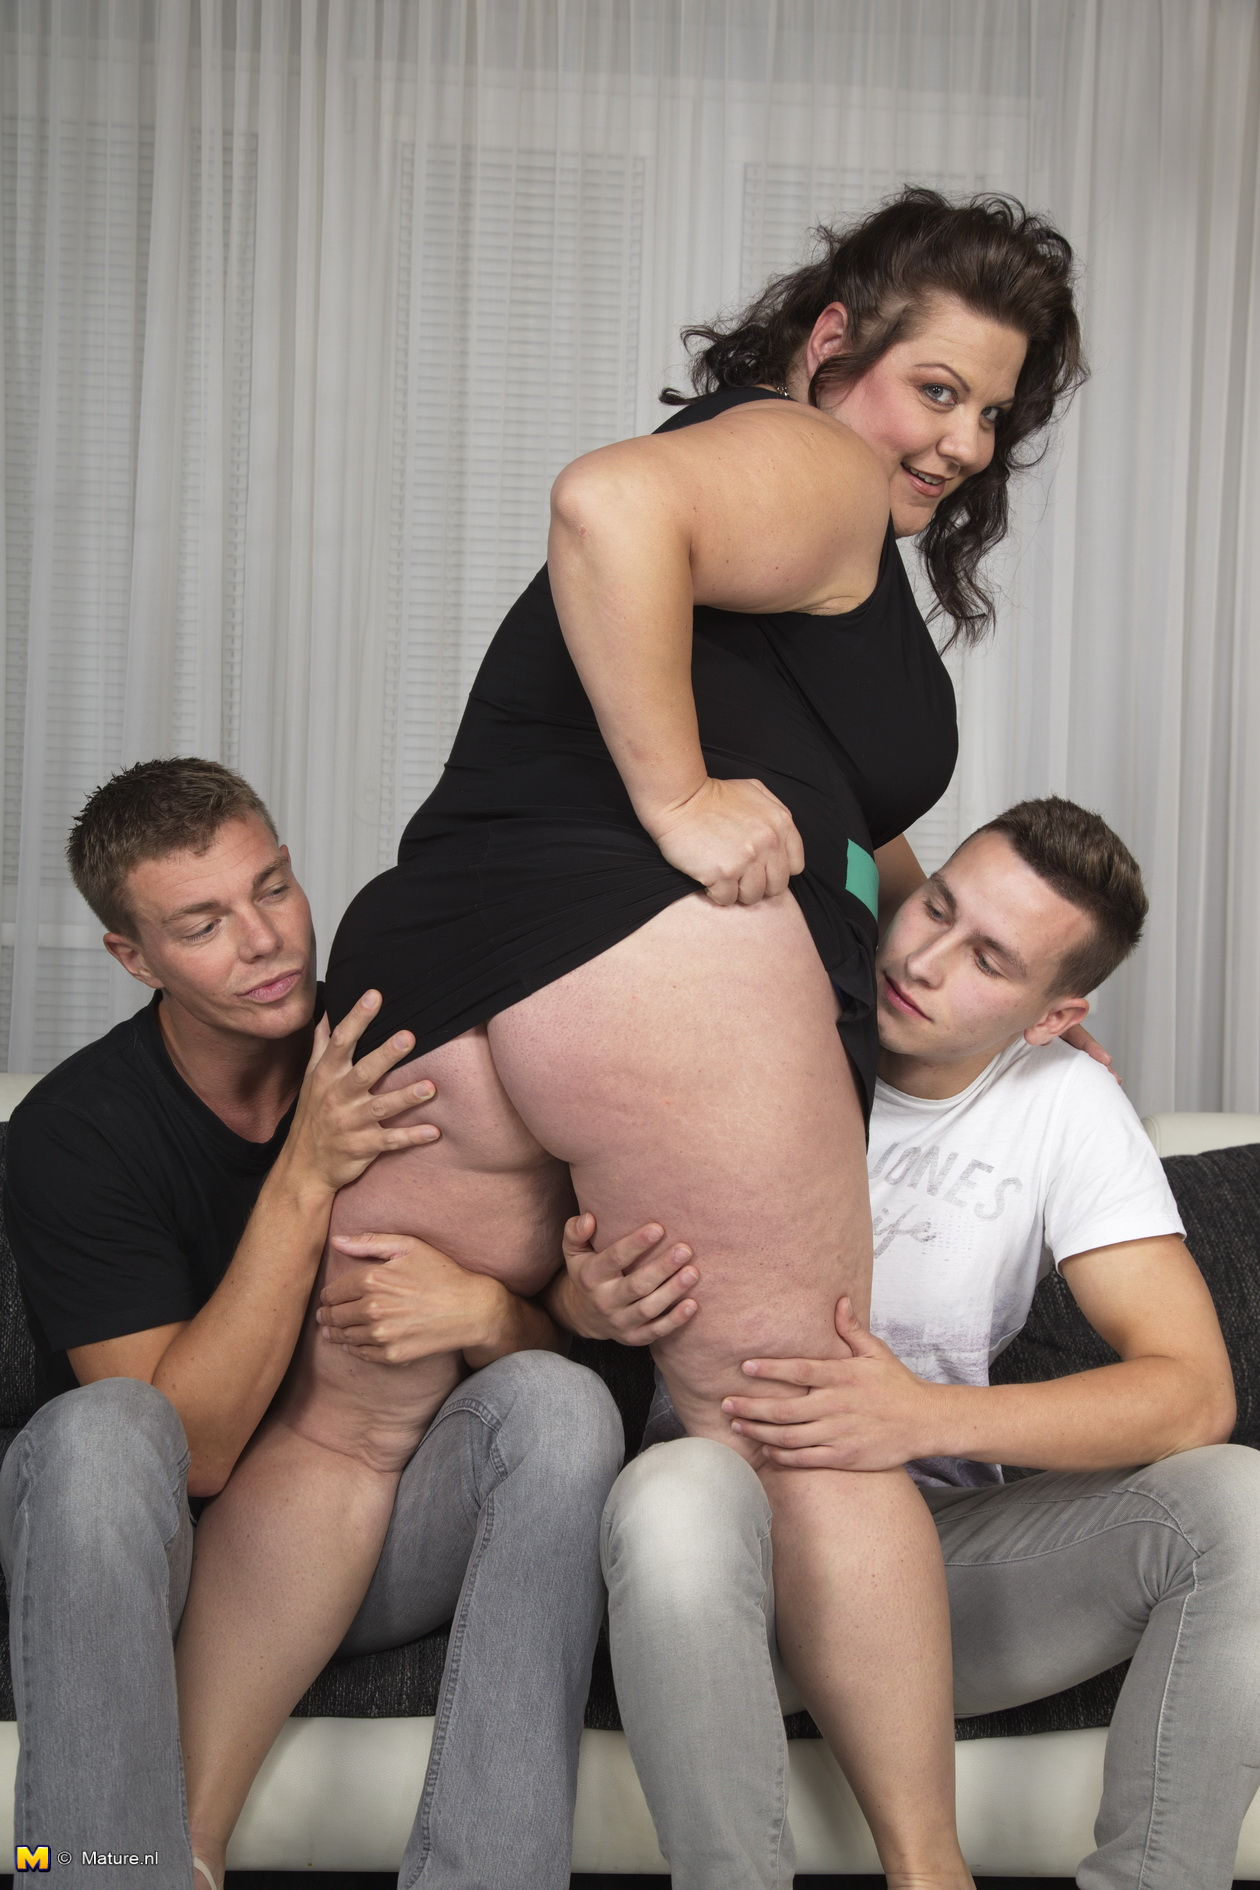 Homemade Threesome Two Guys